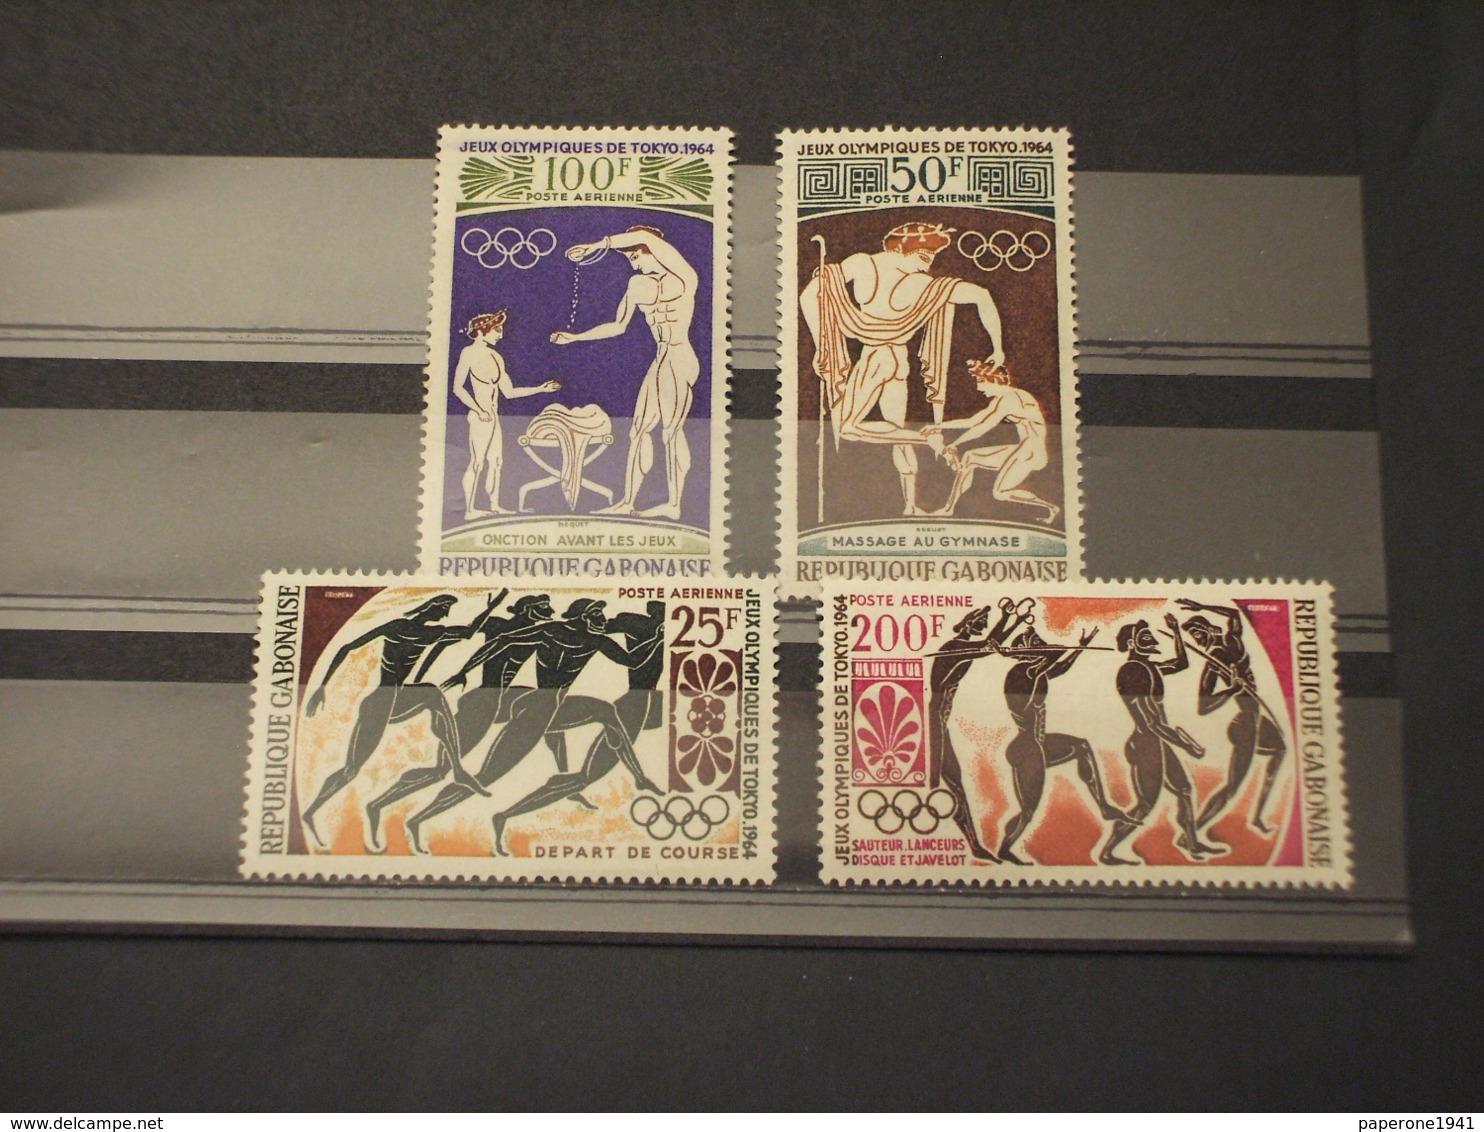 GABON - P-A. 1964 GIOCHI/ARTE GRECA 4 VALORI - NUOVI(++) - Gabon (1960-...)